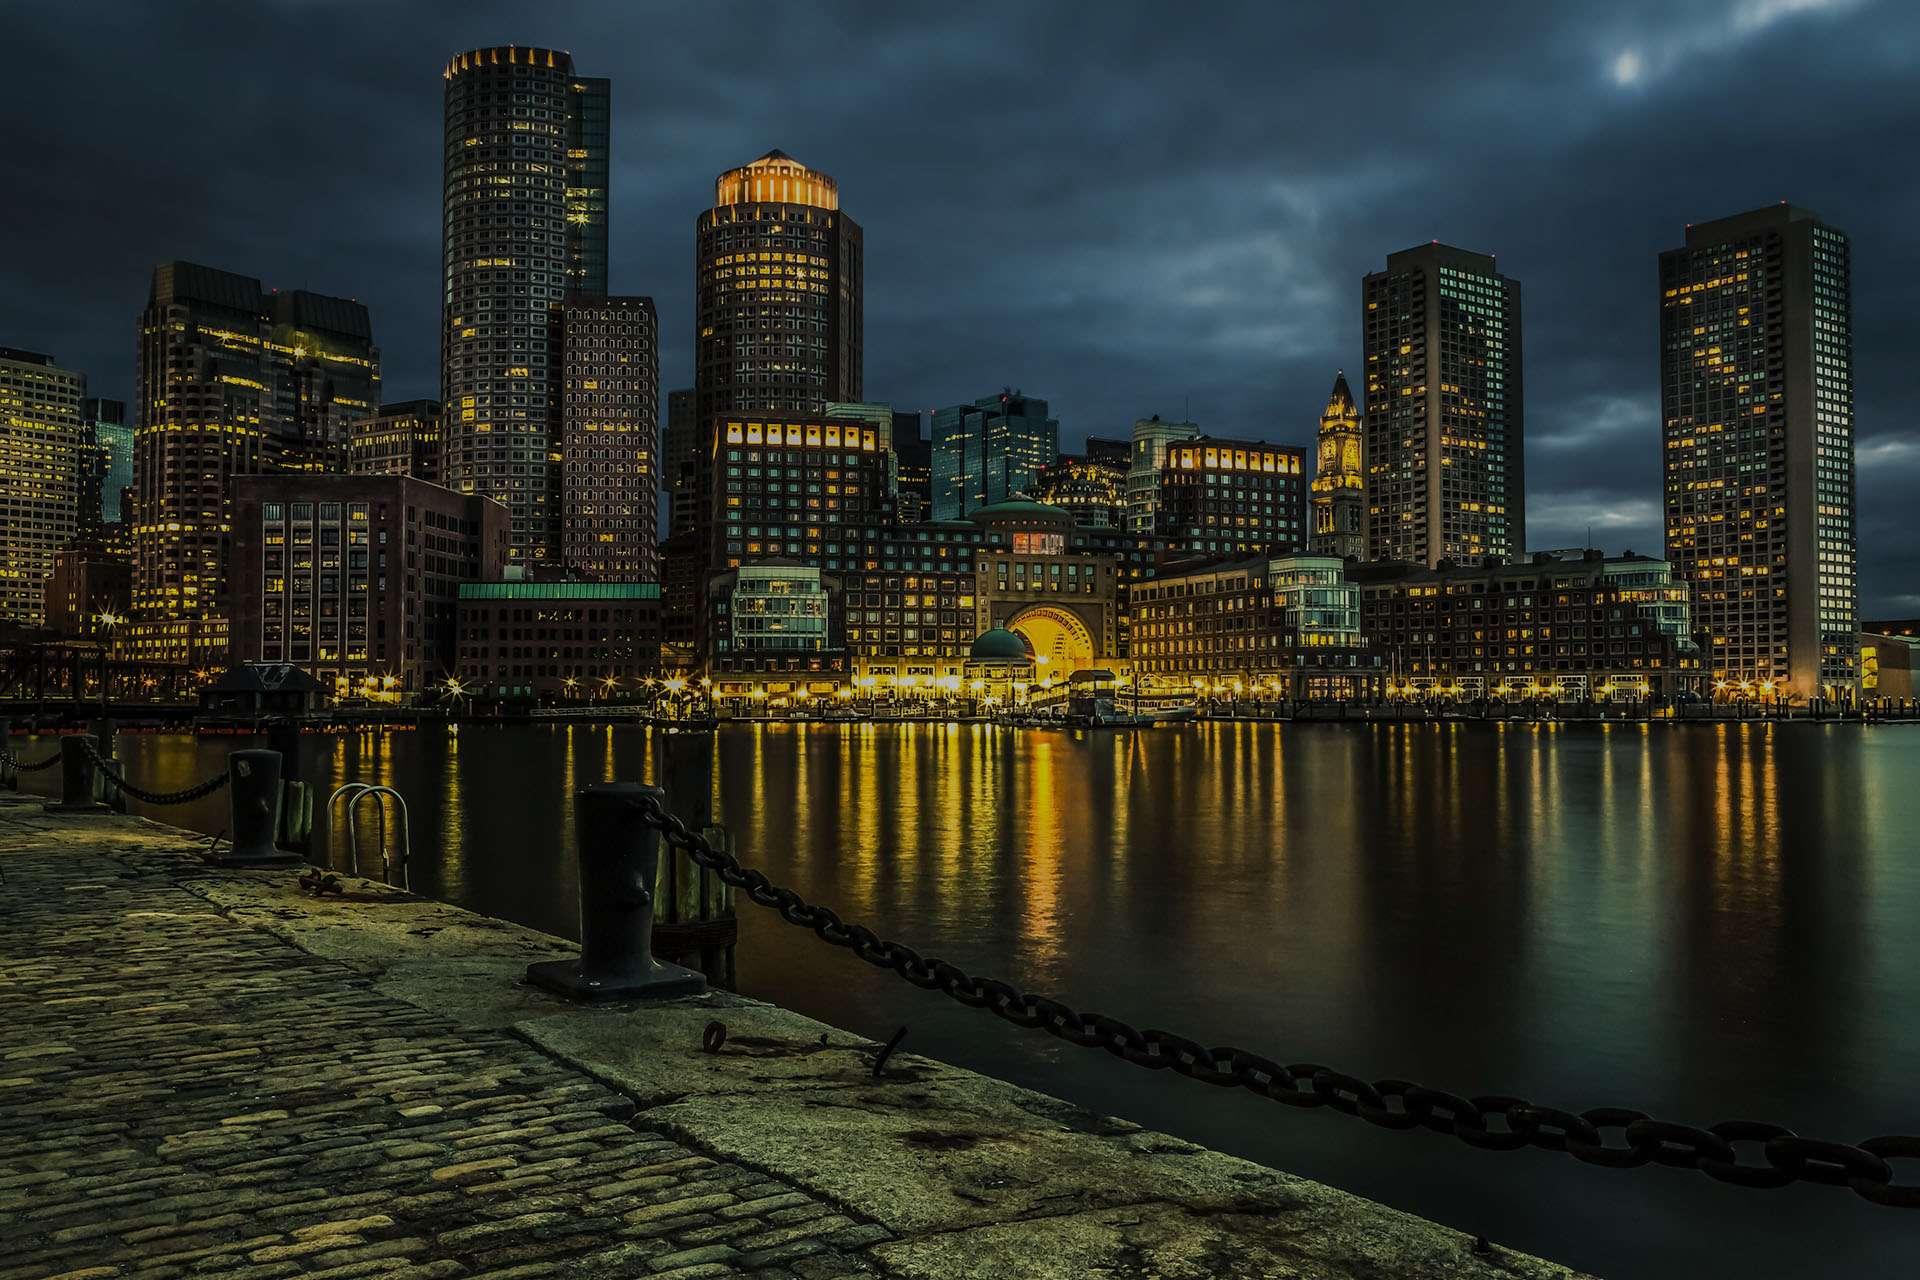 city-7-harbor